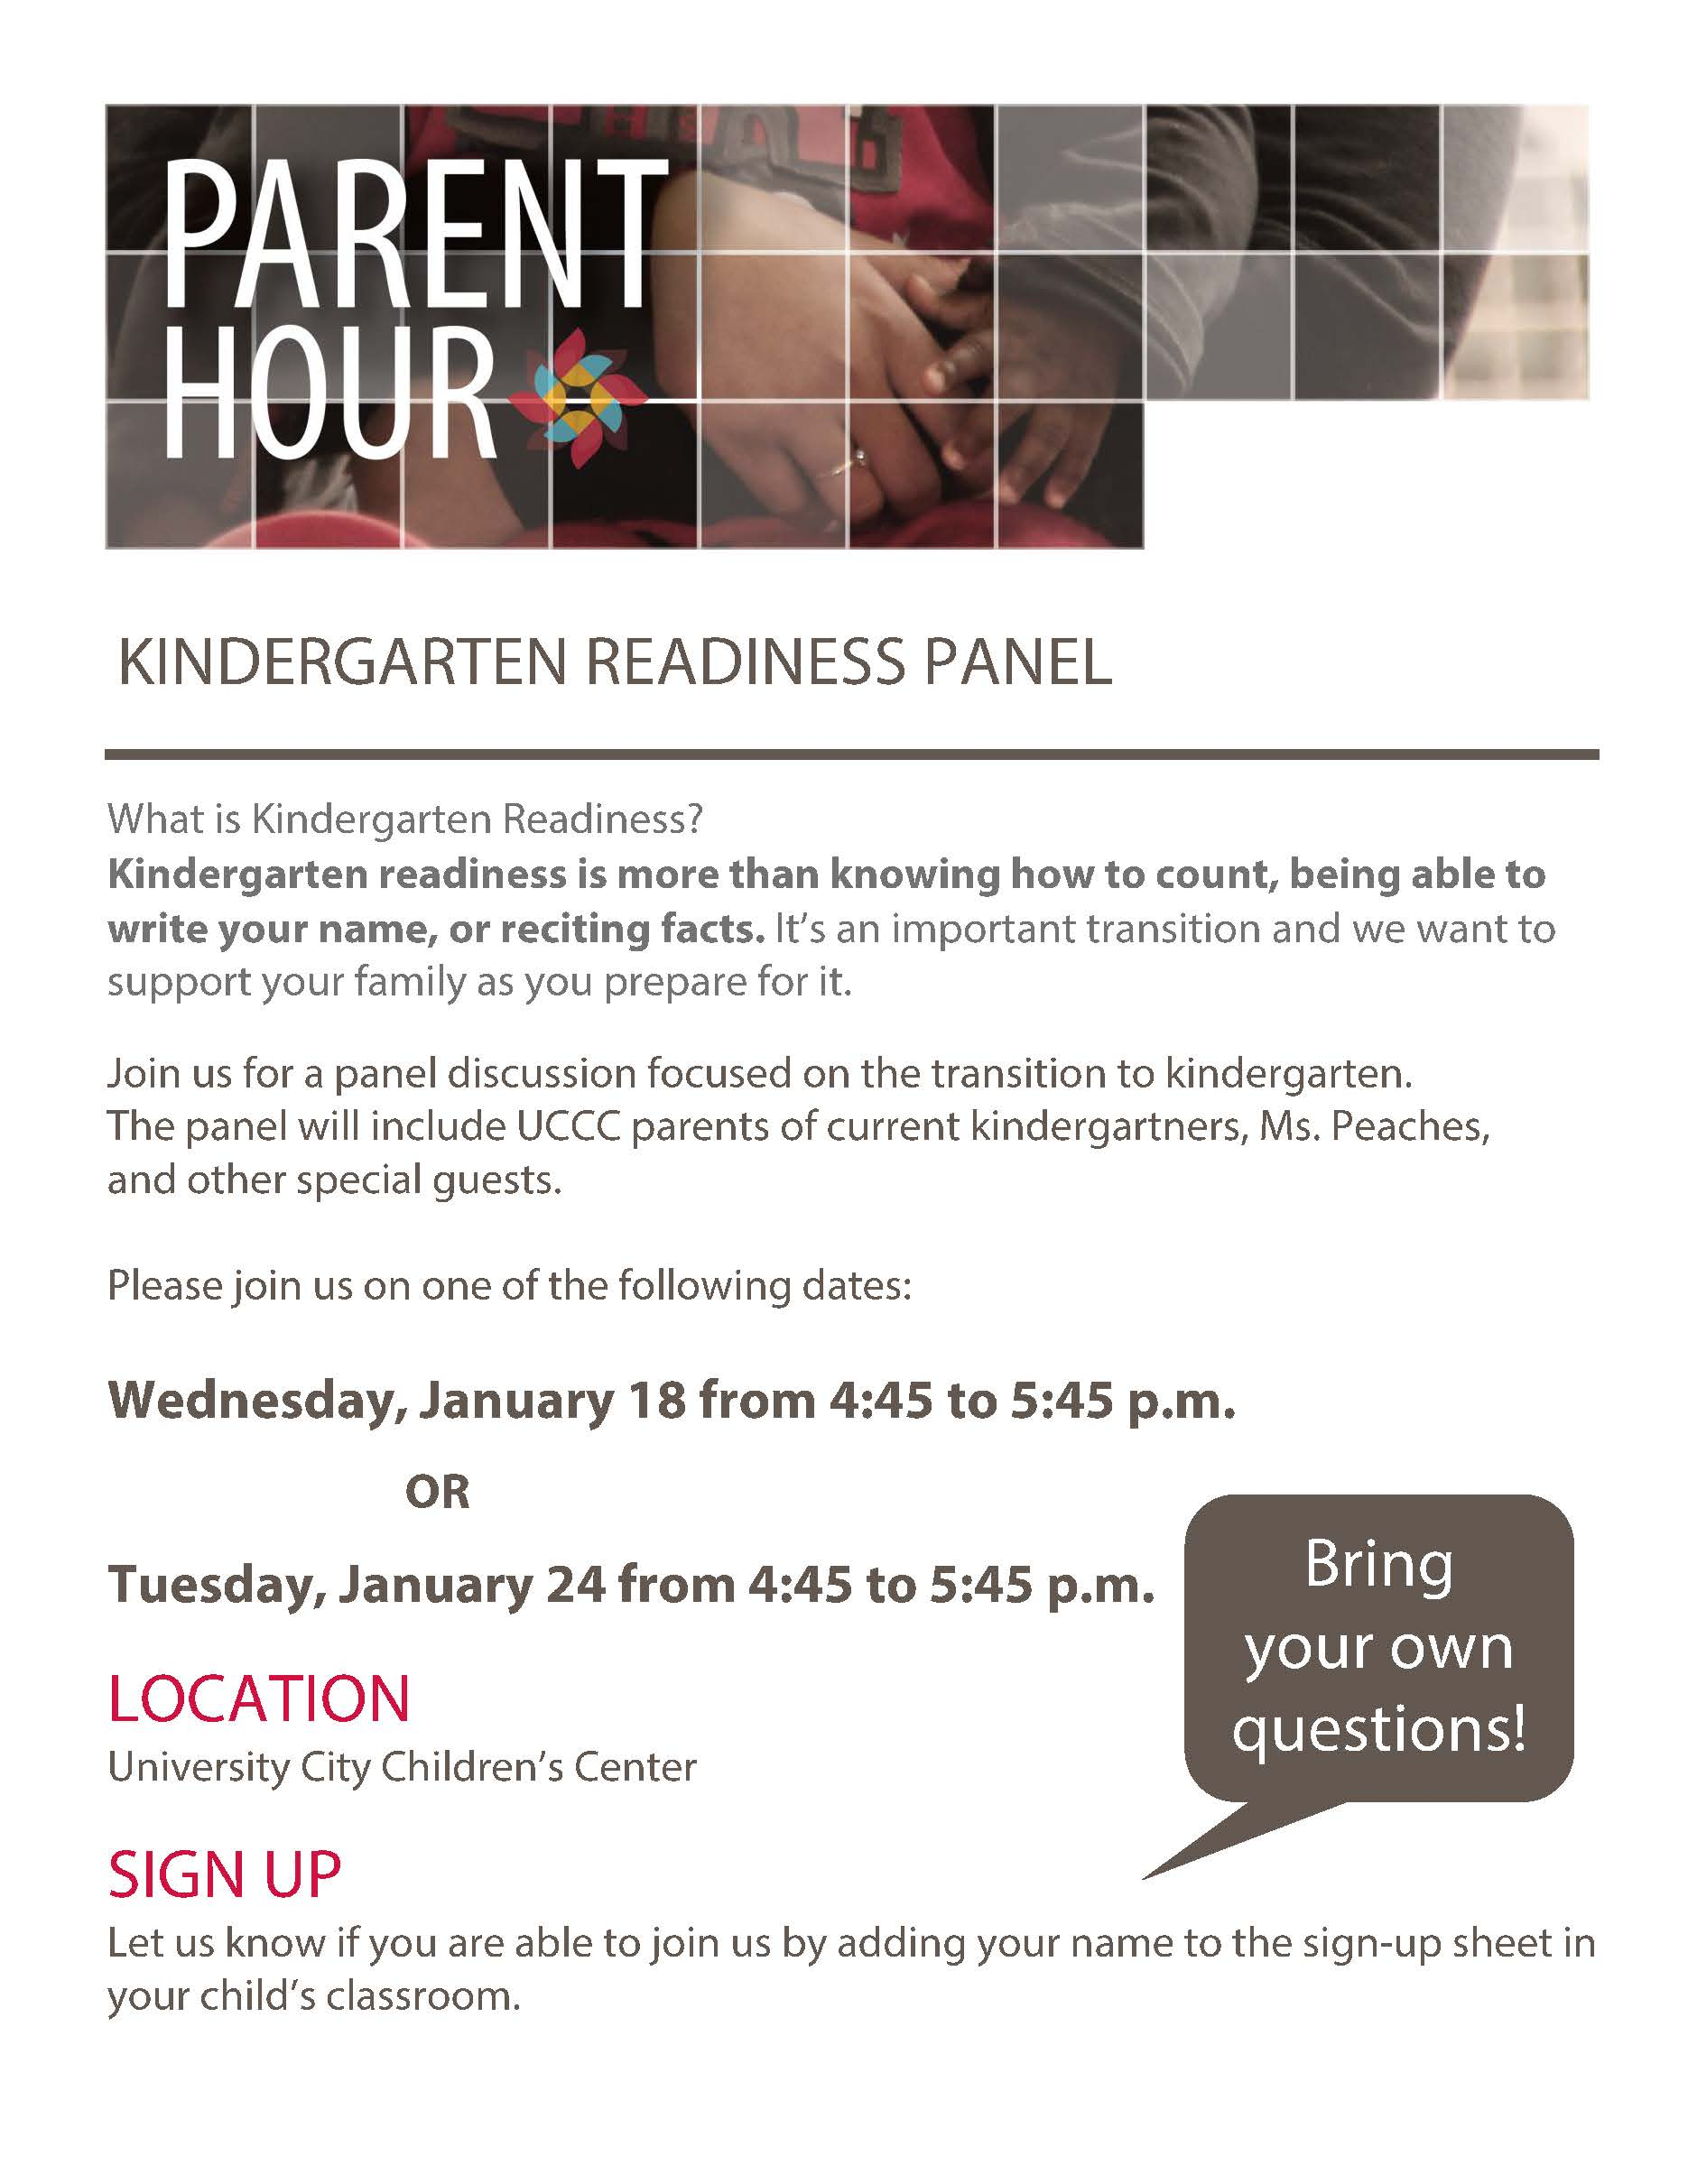 UCCC Kindergarten Readiness Panel